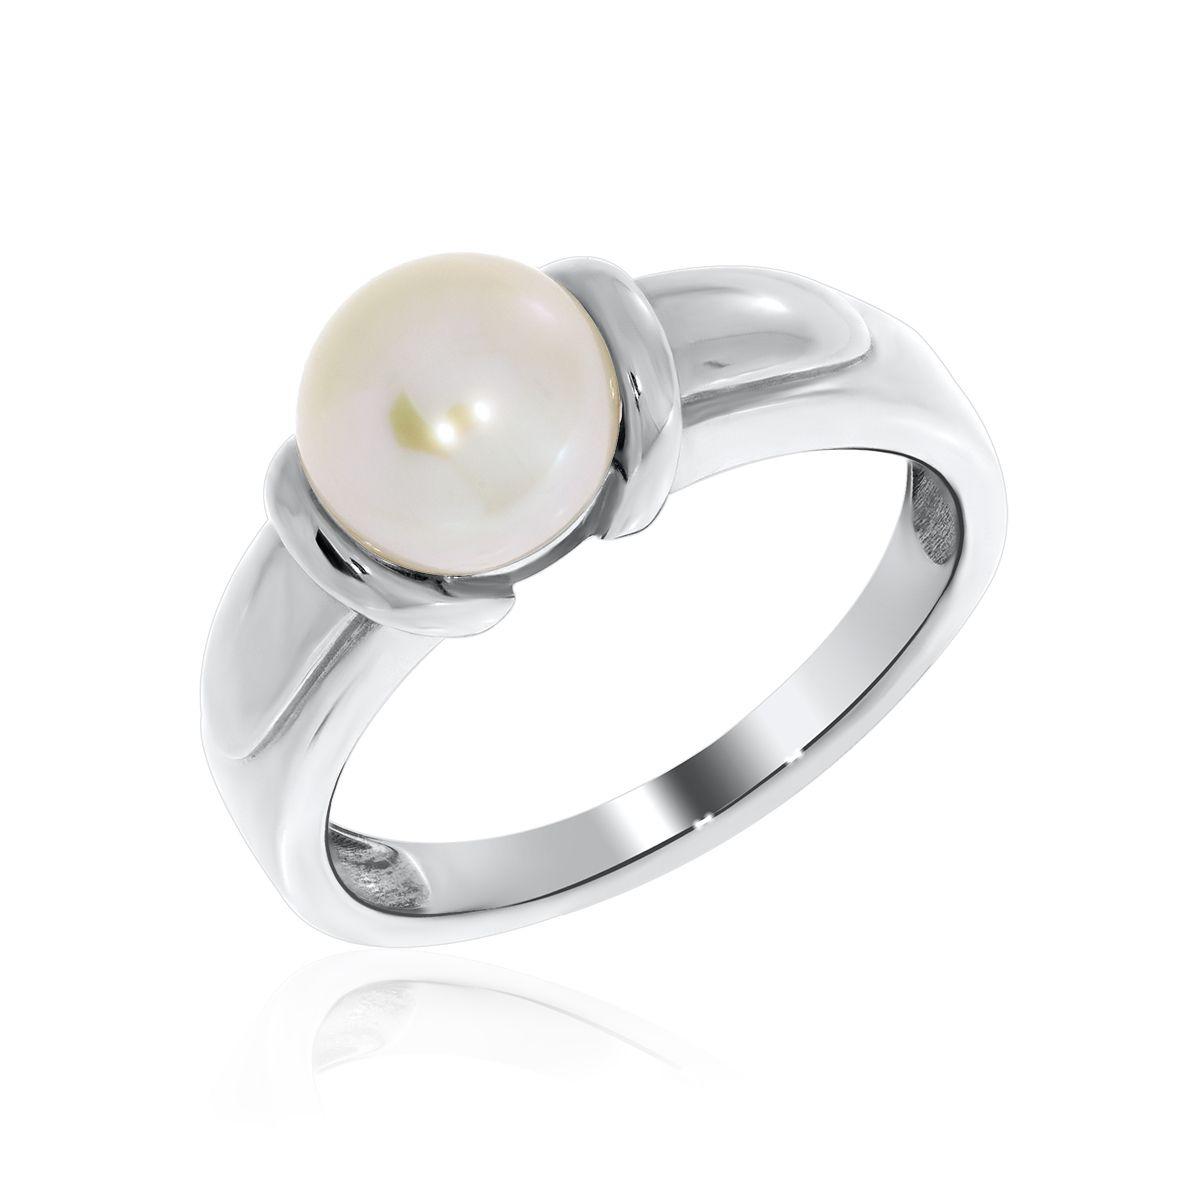 Серебряное кольцо Жемчуг арт. 1340050847 1340050847